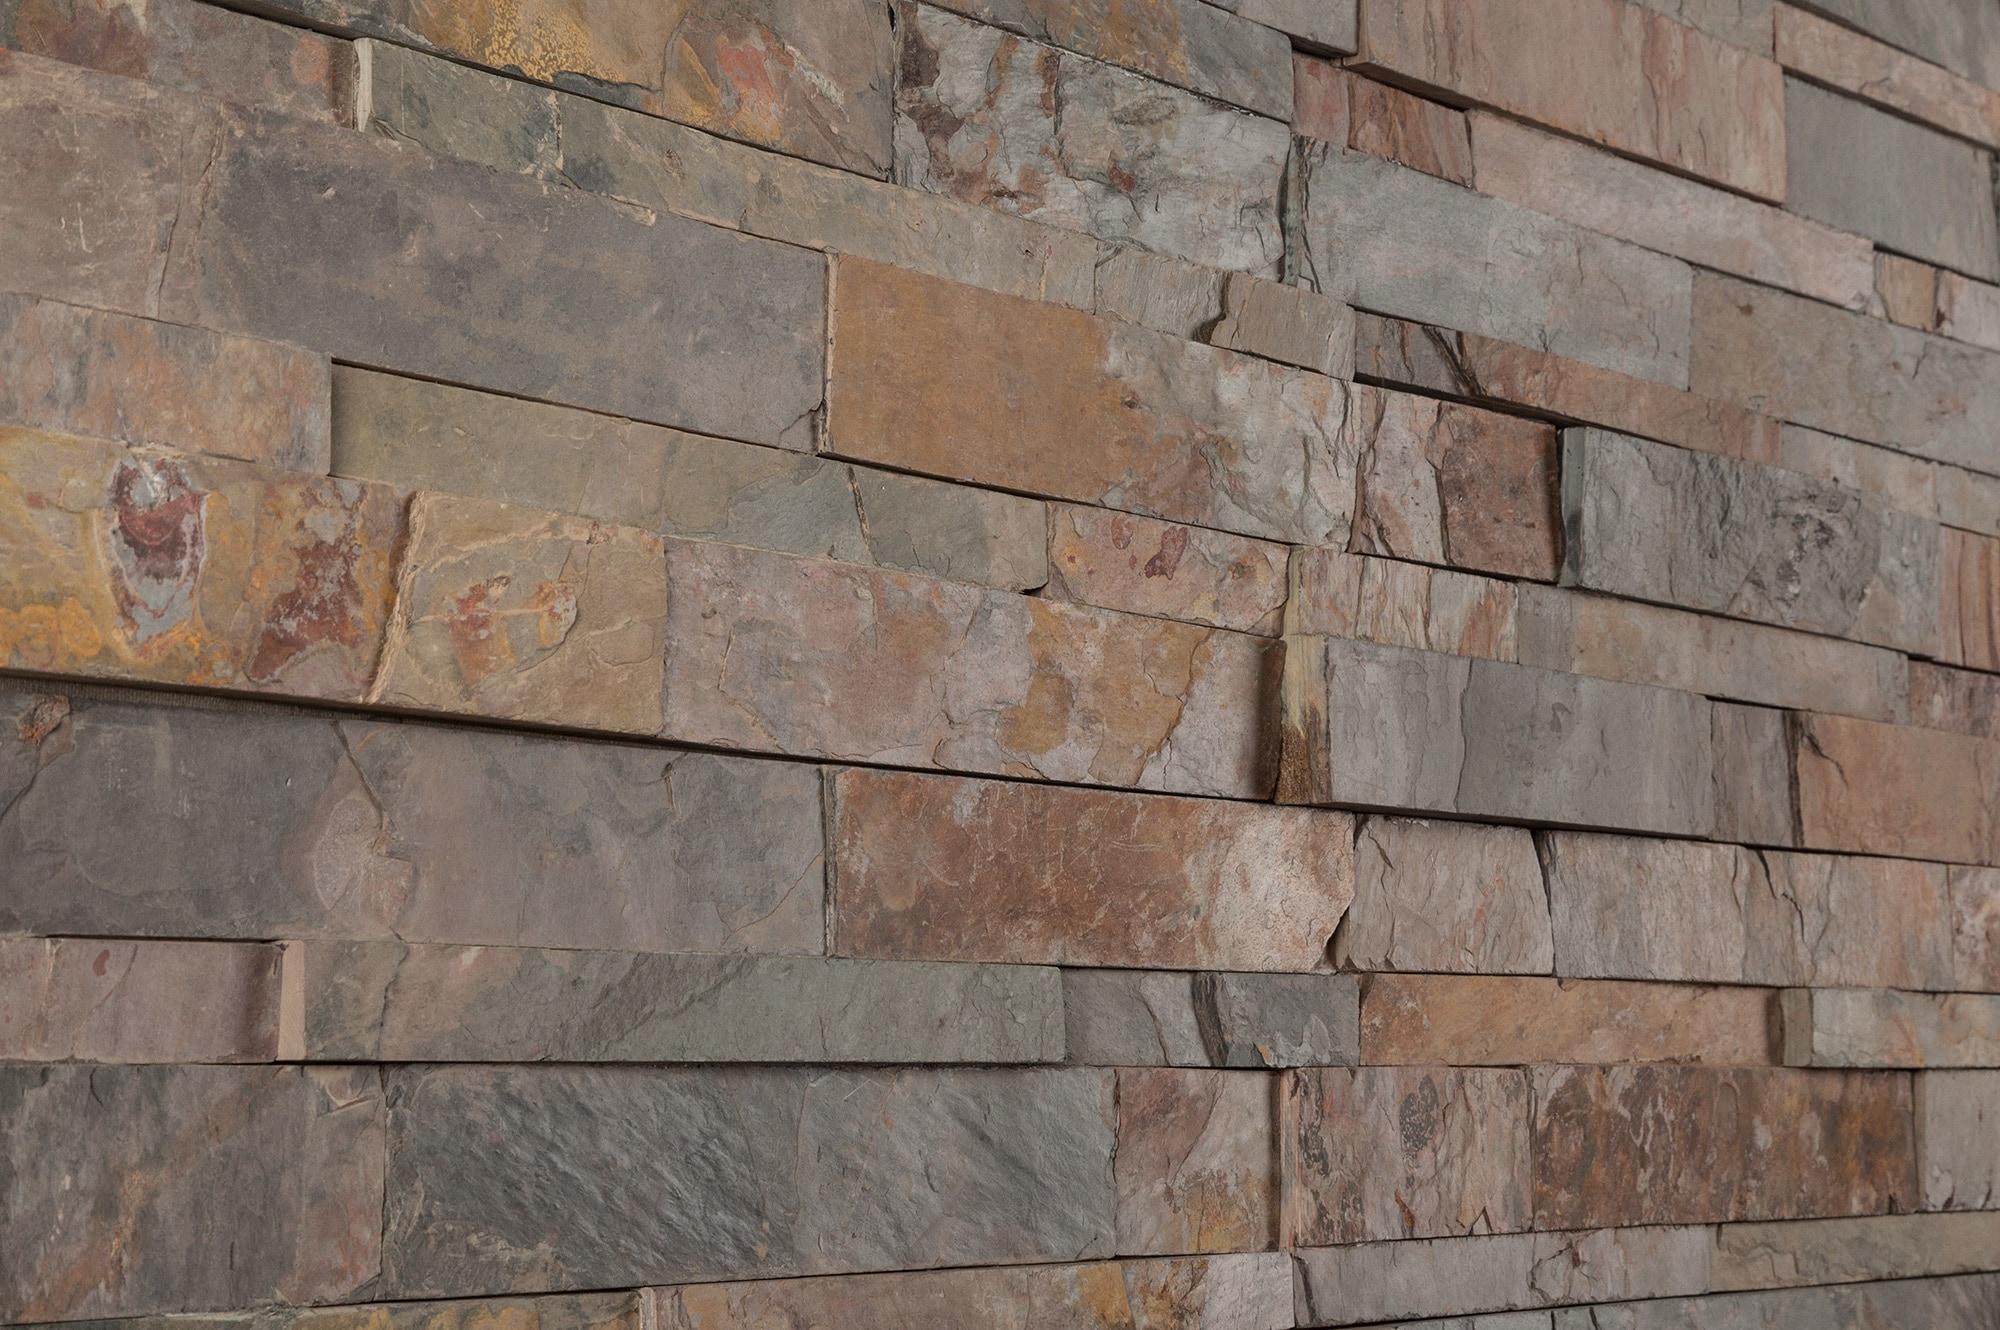 roterra stone siding slate collection california gold ledge stone 6 x24. Black Bedroom Furniture Sets. Home Design Ideas